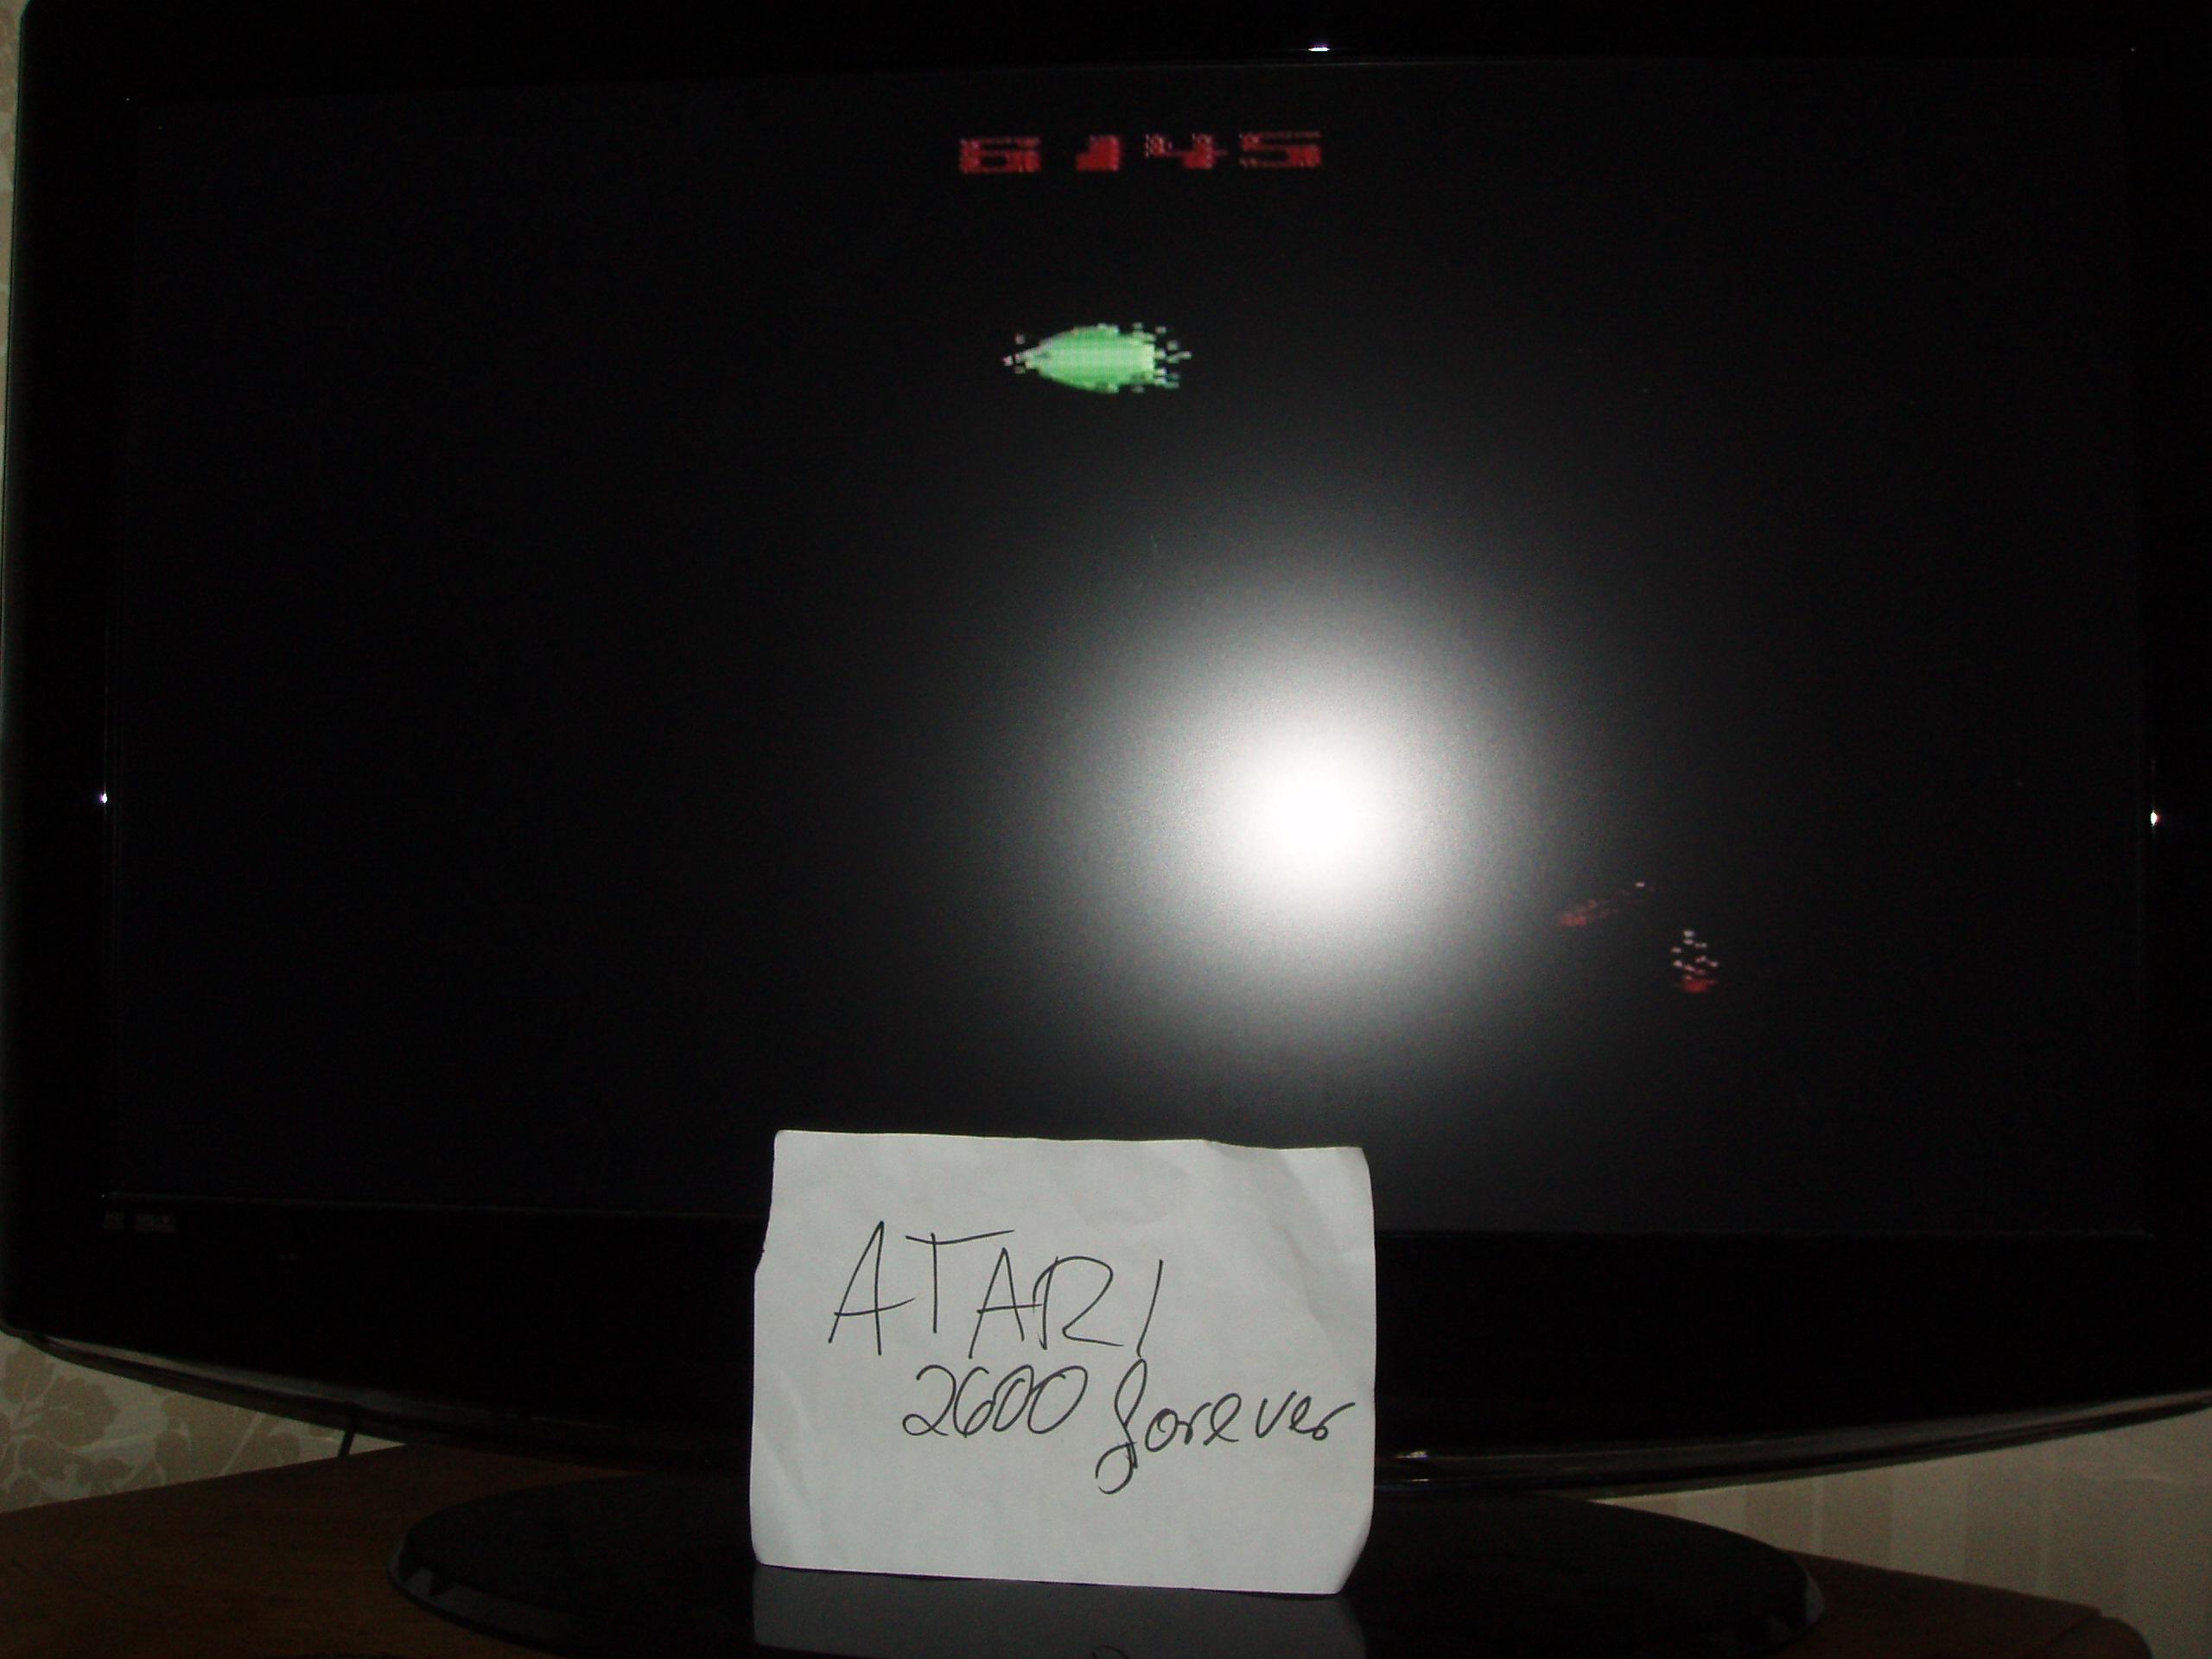 atari2600forever: Moonsweeper (Atari 2600 Novice/B) 6,145 points on 2018-11-20 03:10:17